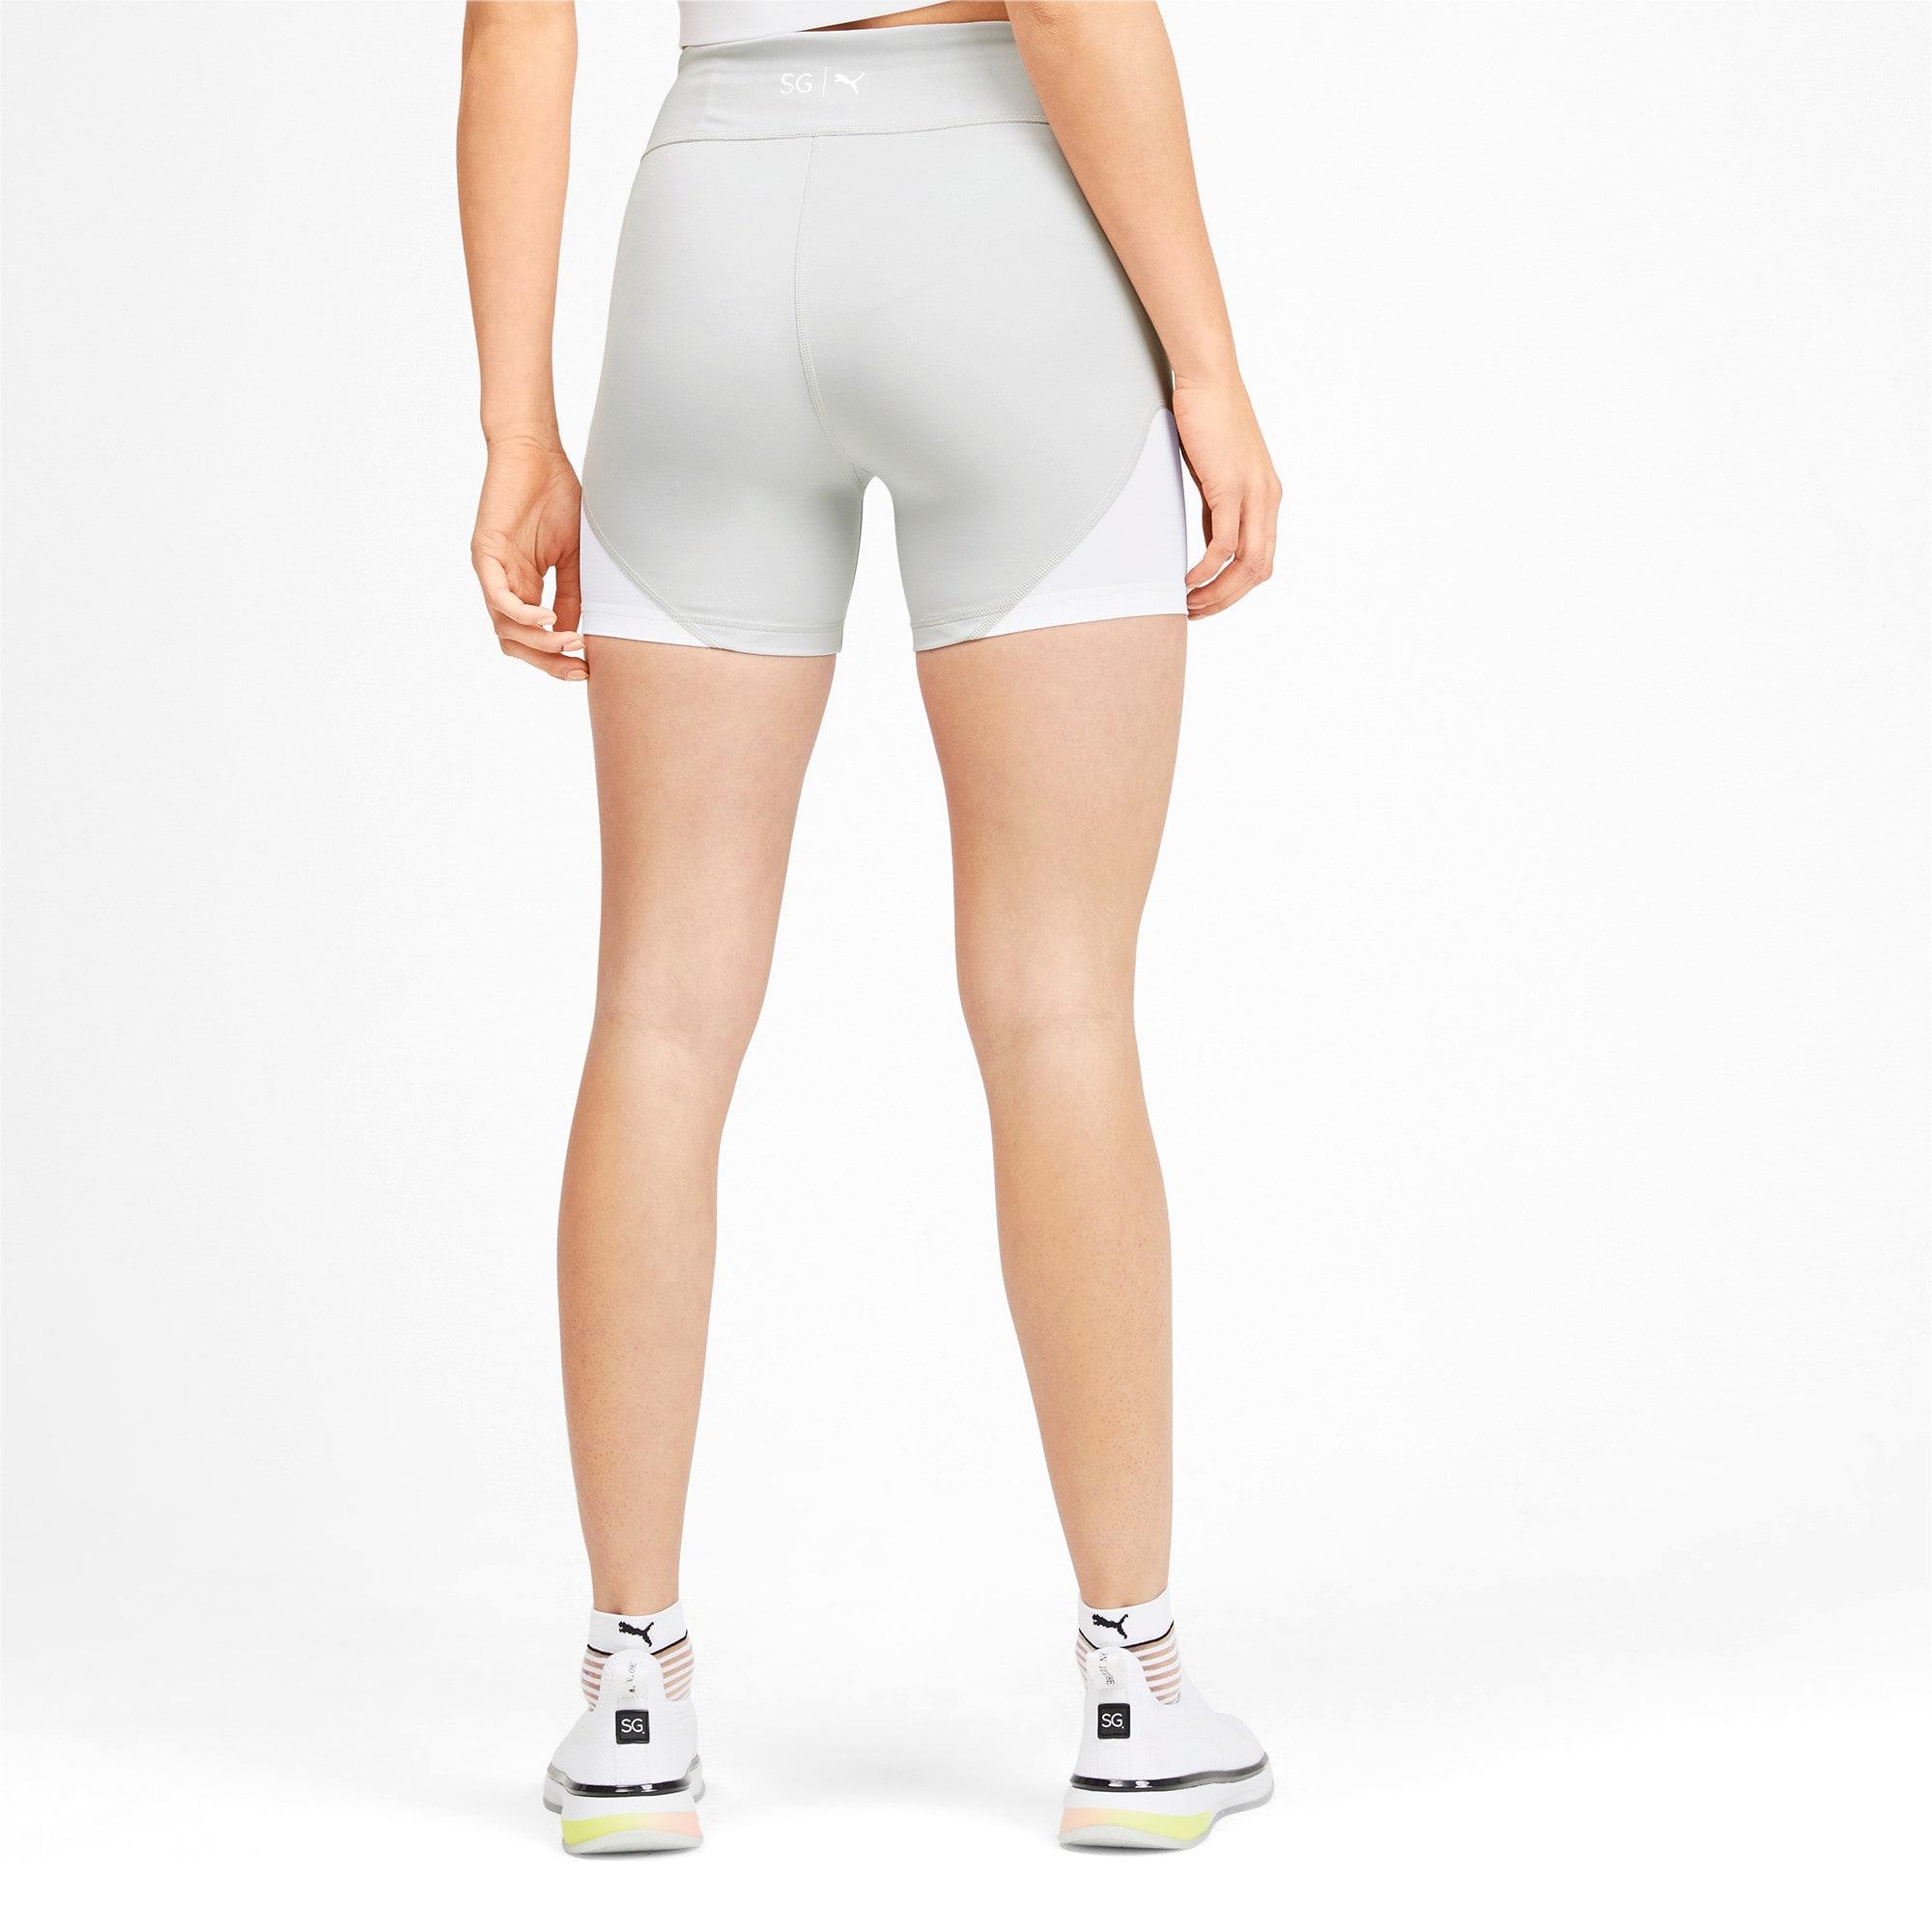 Miniatura 2 de Shorts SG x PUMA, Glacier Gray-Puma White, mediano